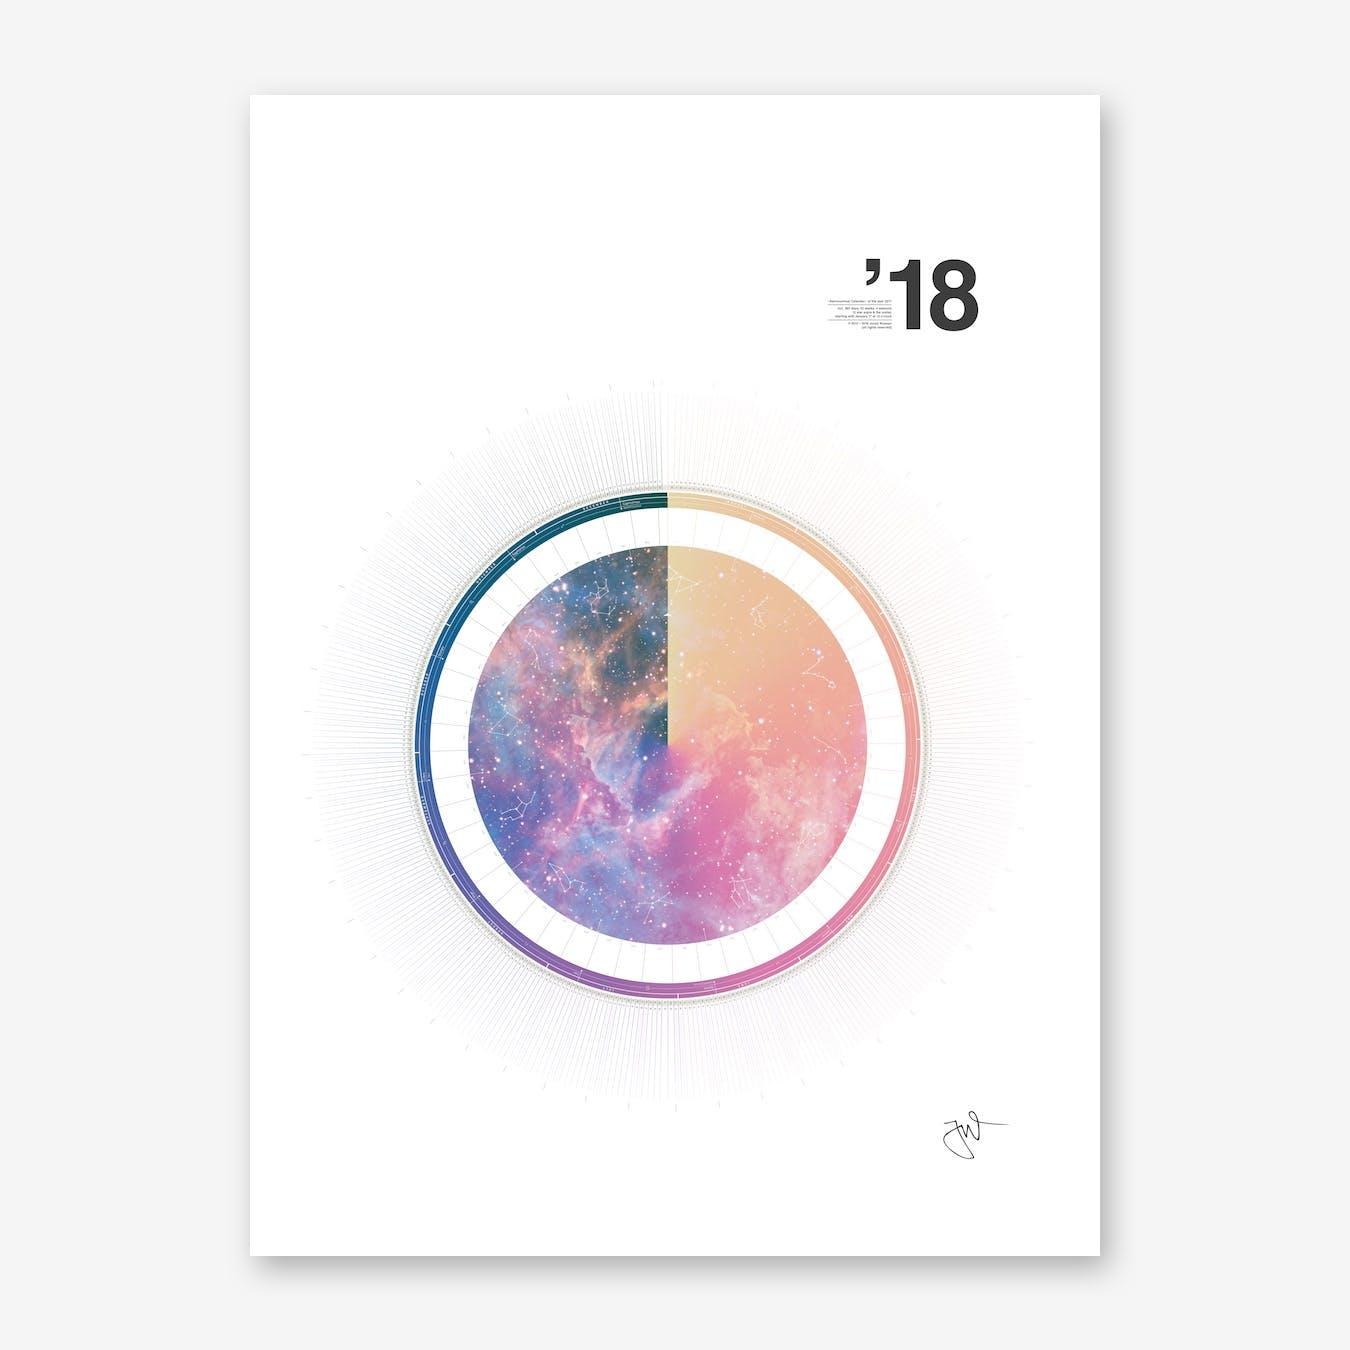 Astronomical Calendar 2018